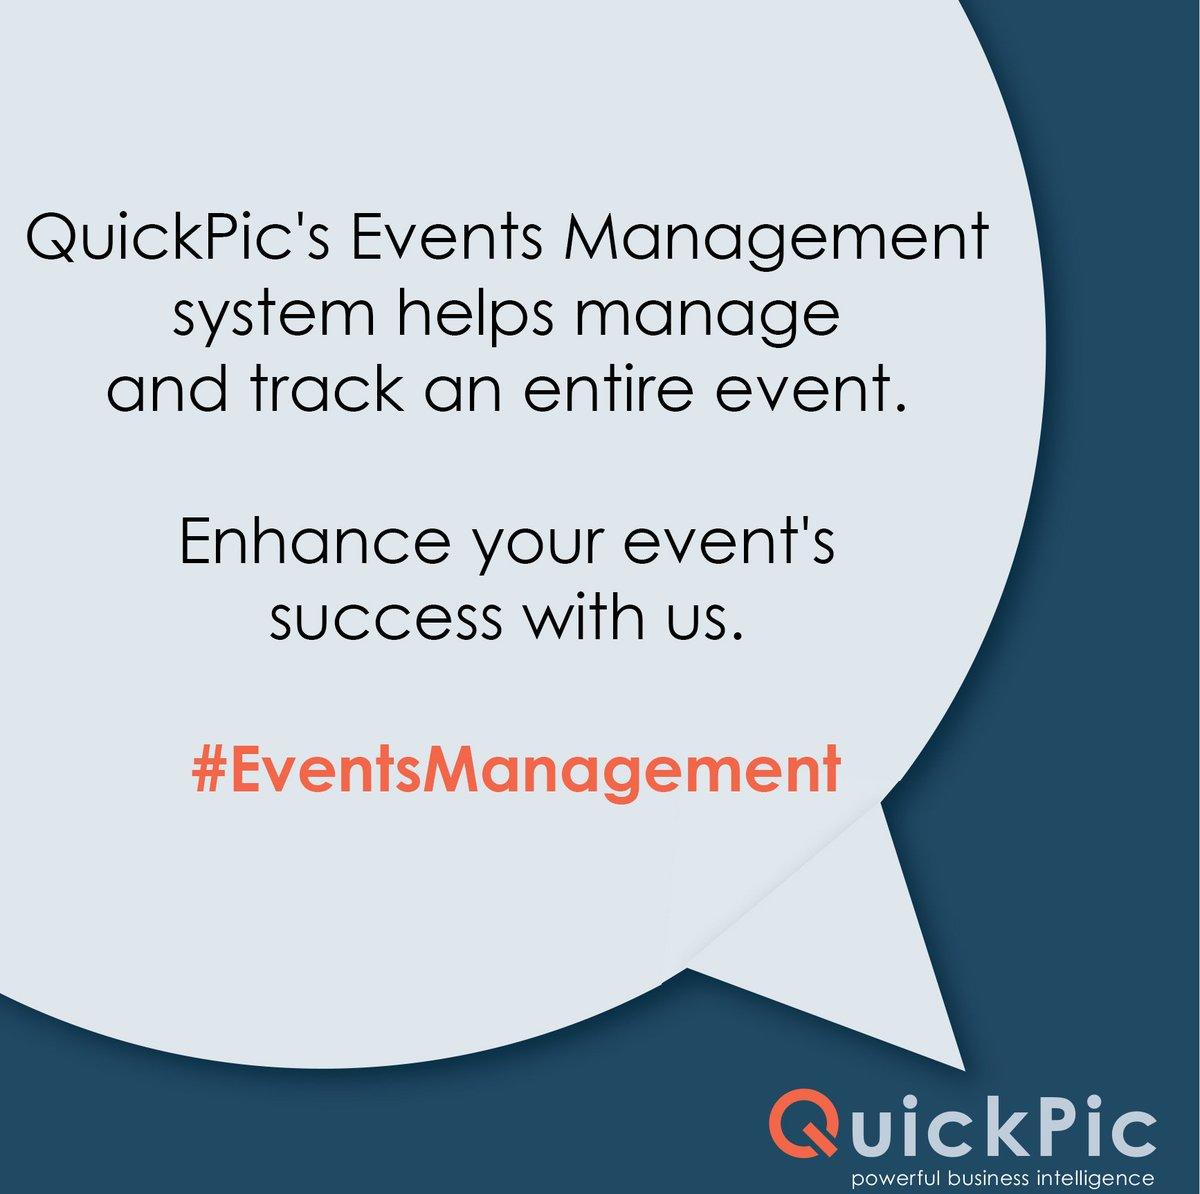 QuickPic on JumPic com